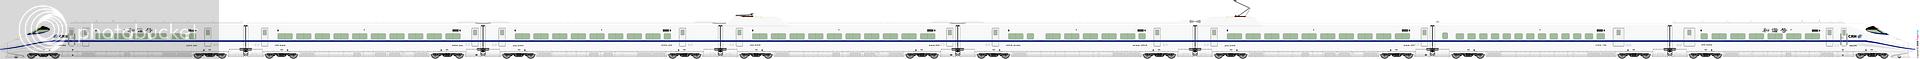 [5126] China Railway Wuhan 2126